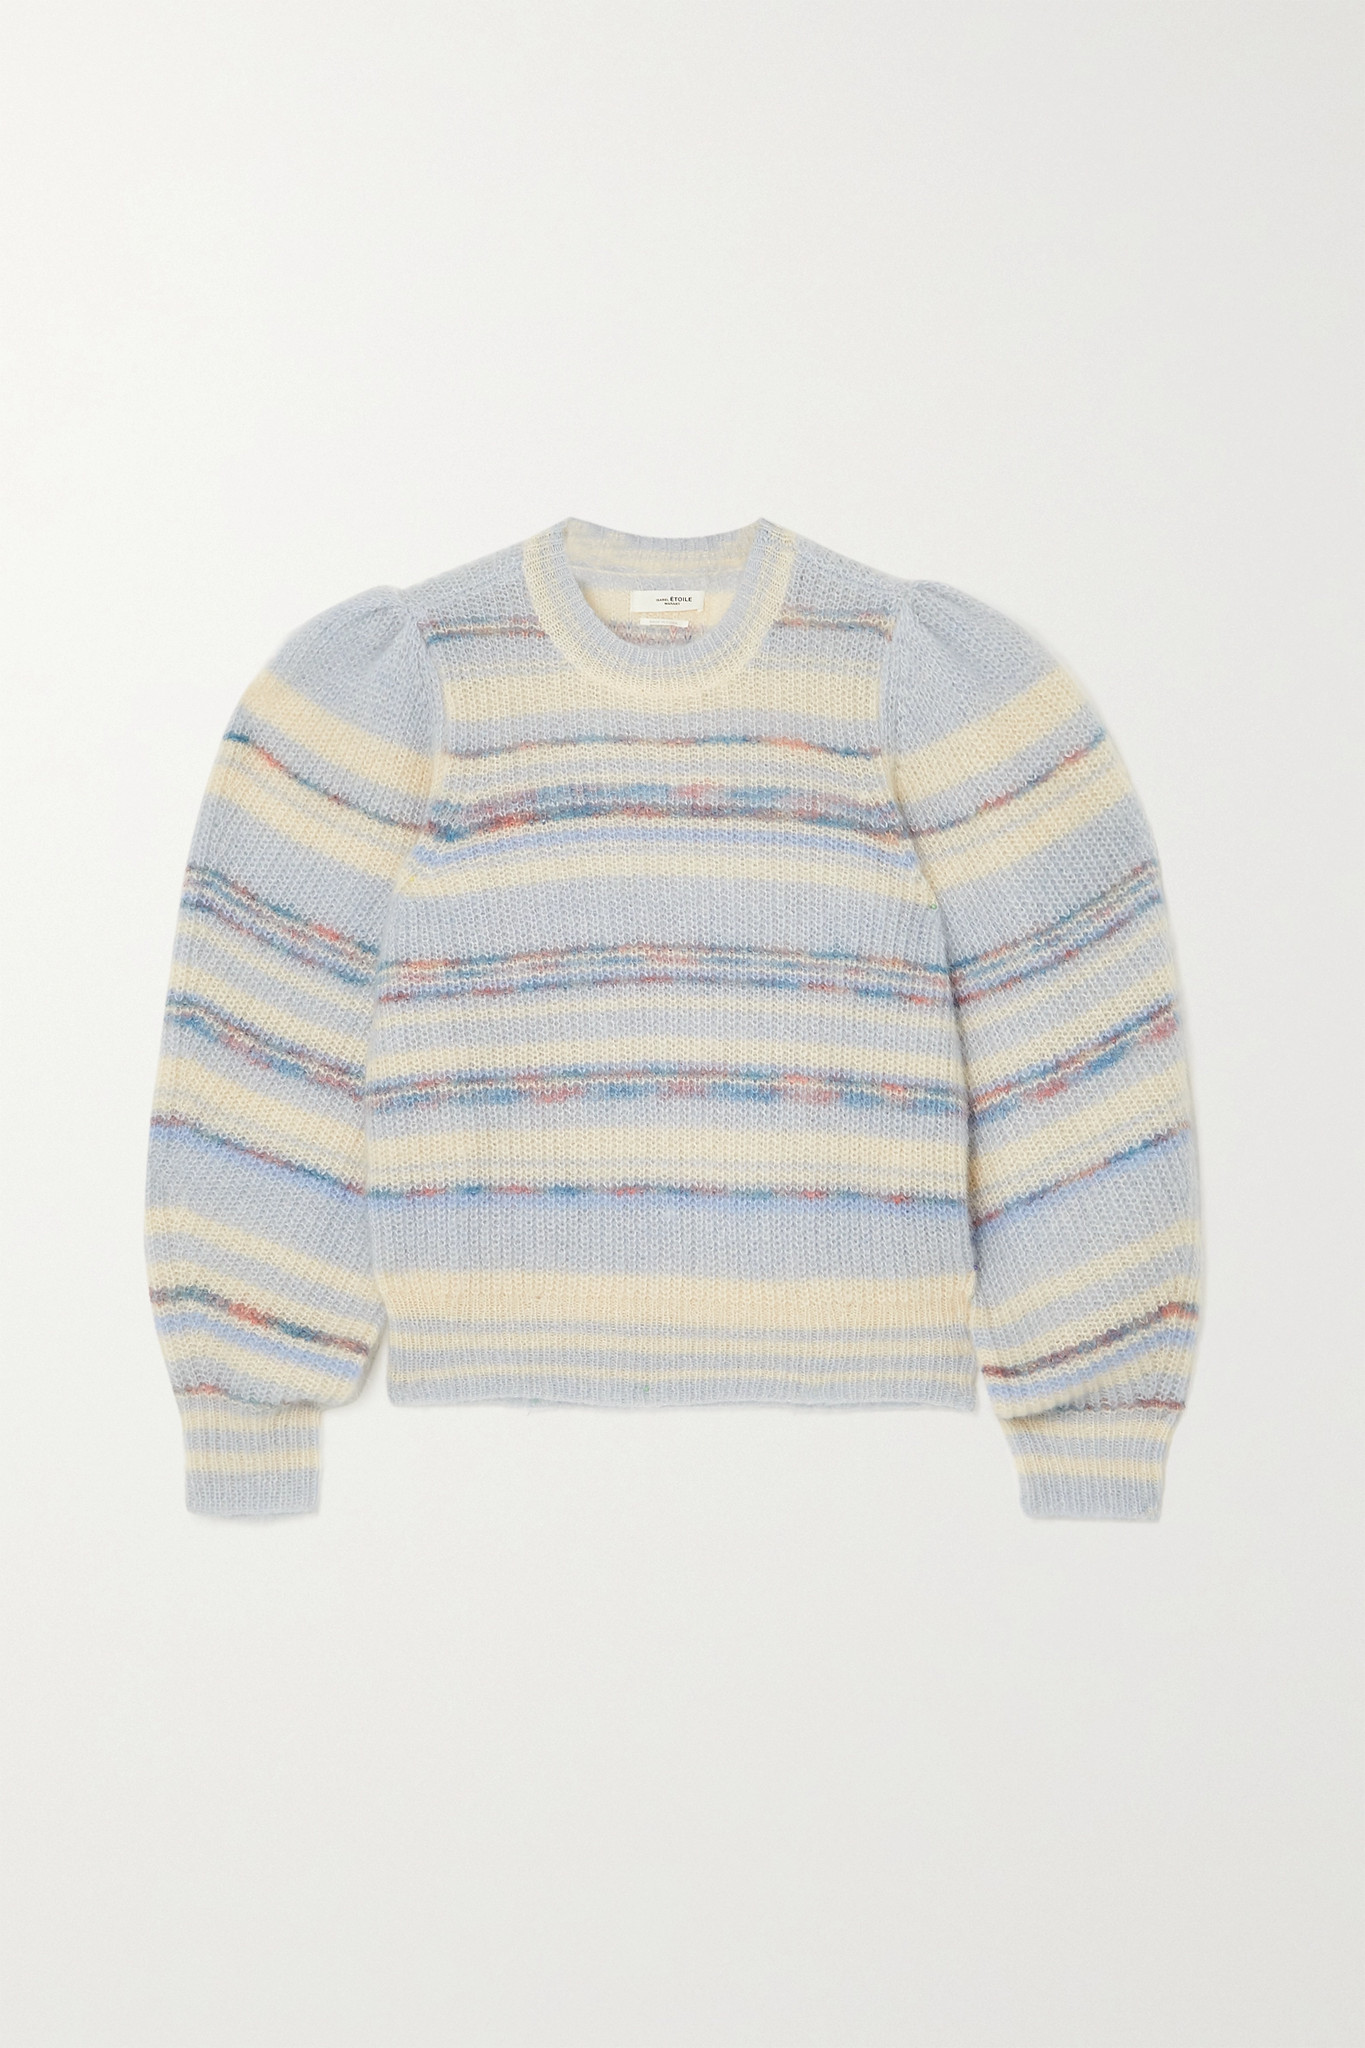 ISABEL MARANT ÉTOILE - Eleonore Striped Mohair-blend Sweater - Blue - FR42